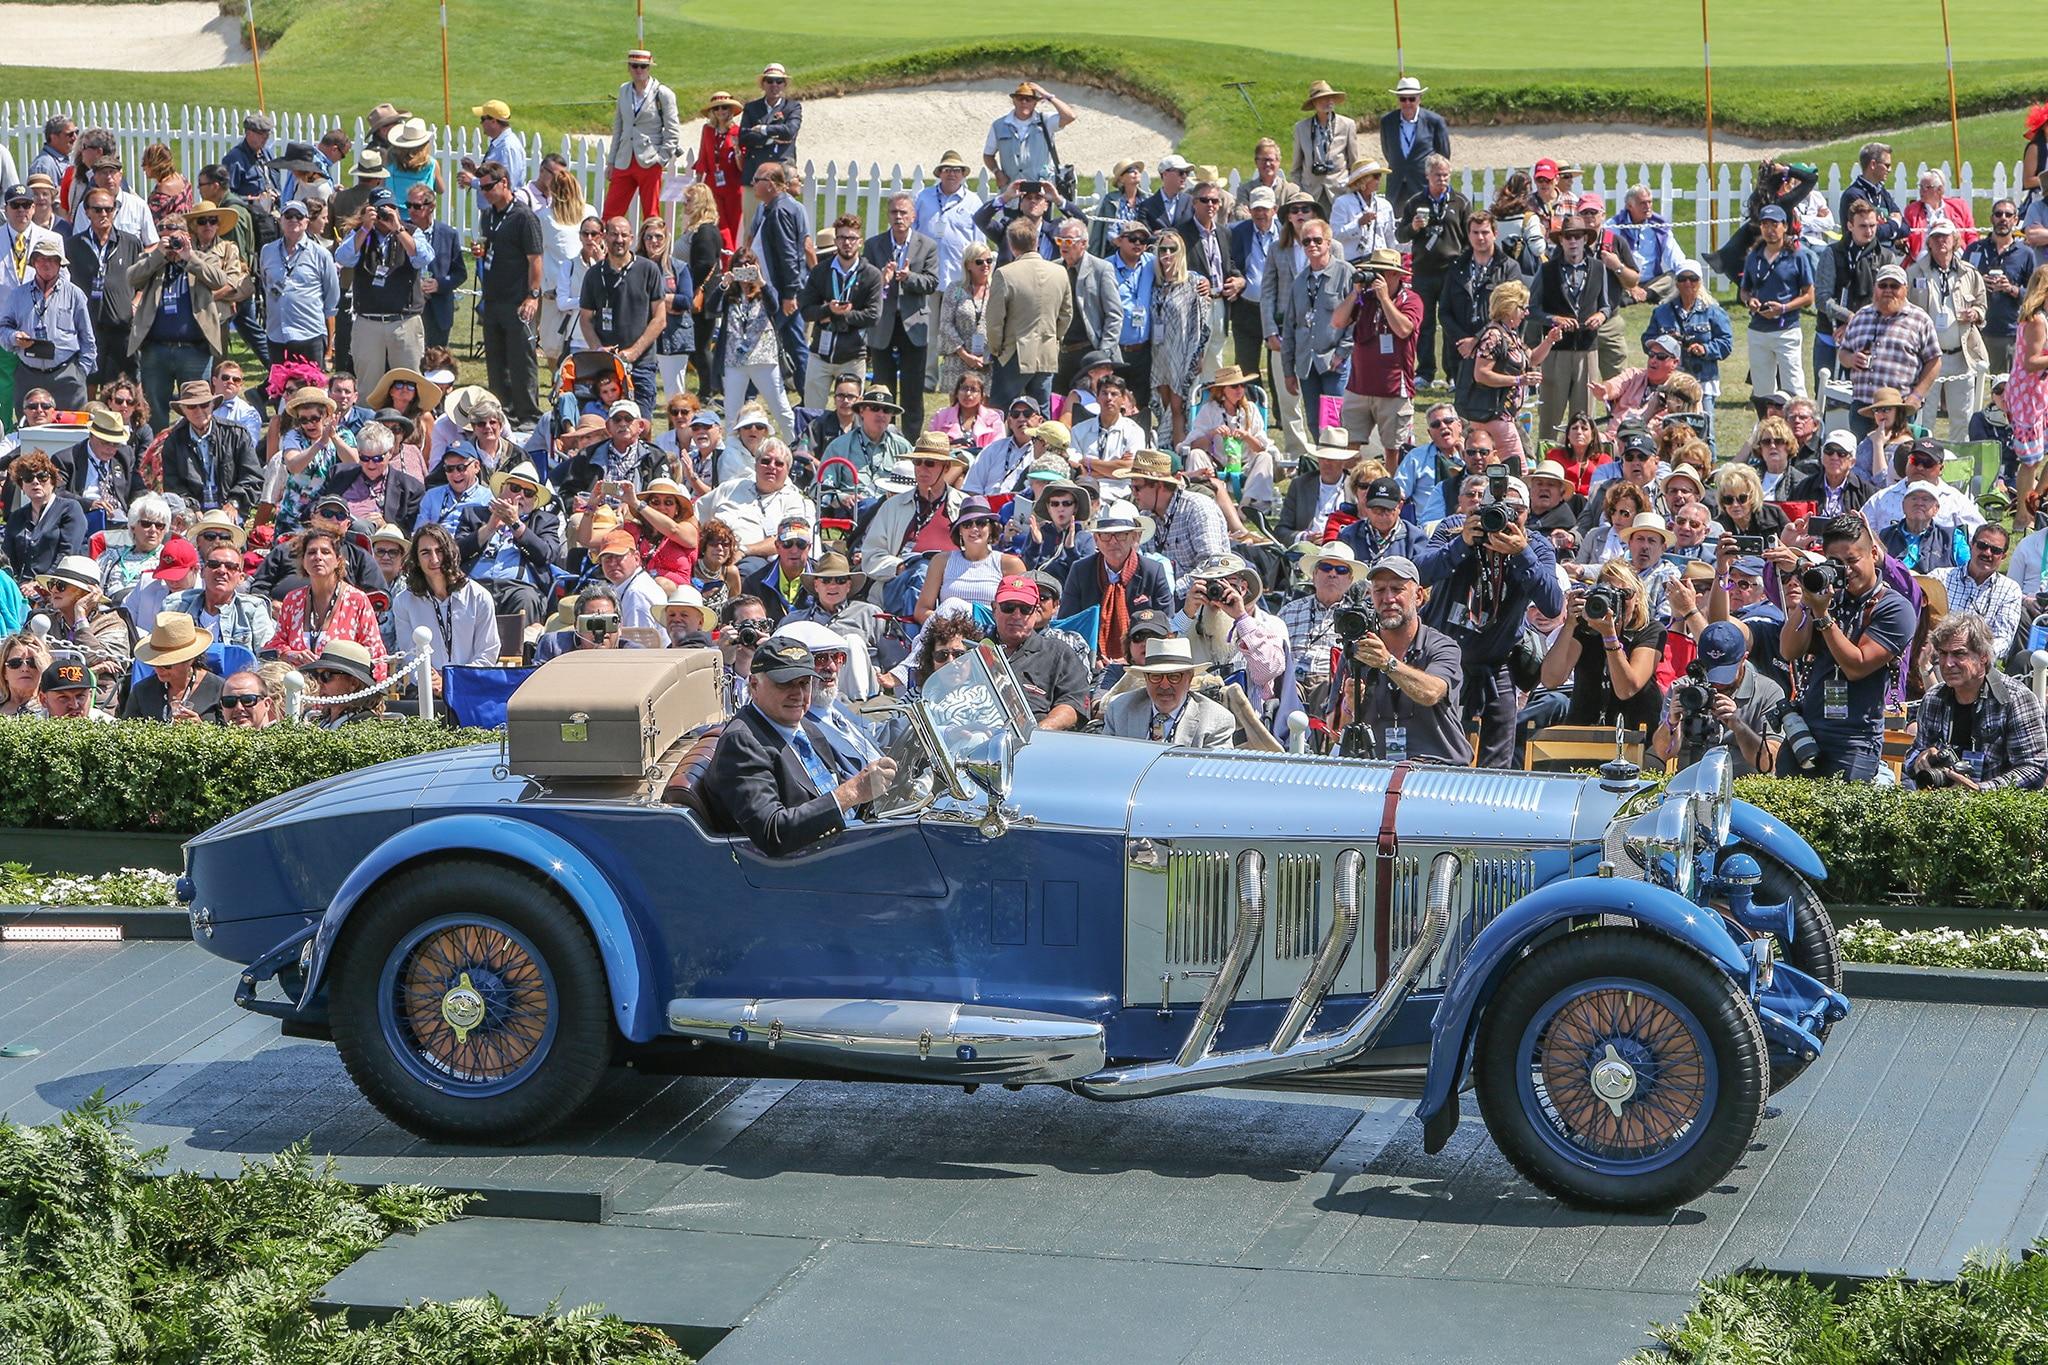 2017 Pebble Beach Concours Ramp Cars 01 1929 Mercedes Benz S Barker Tourer